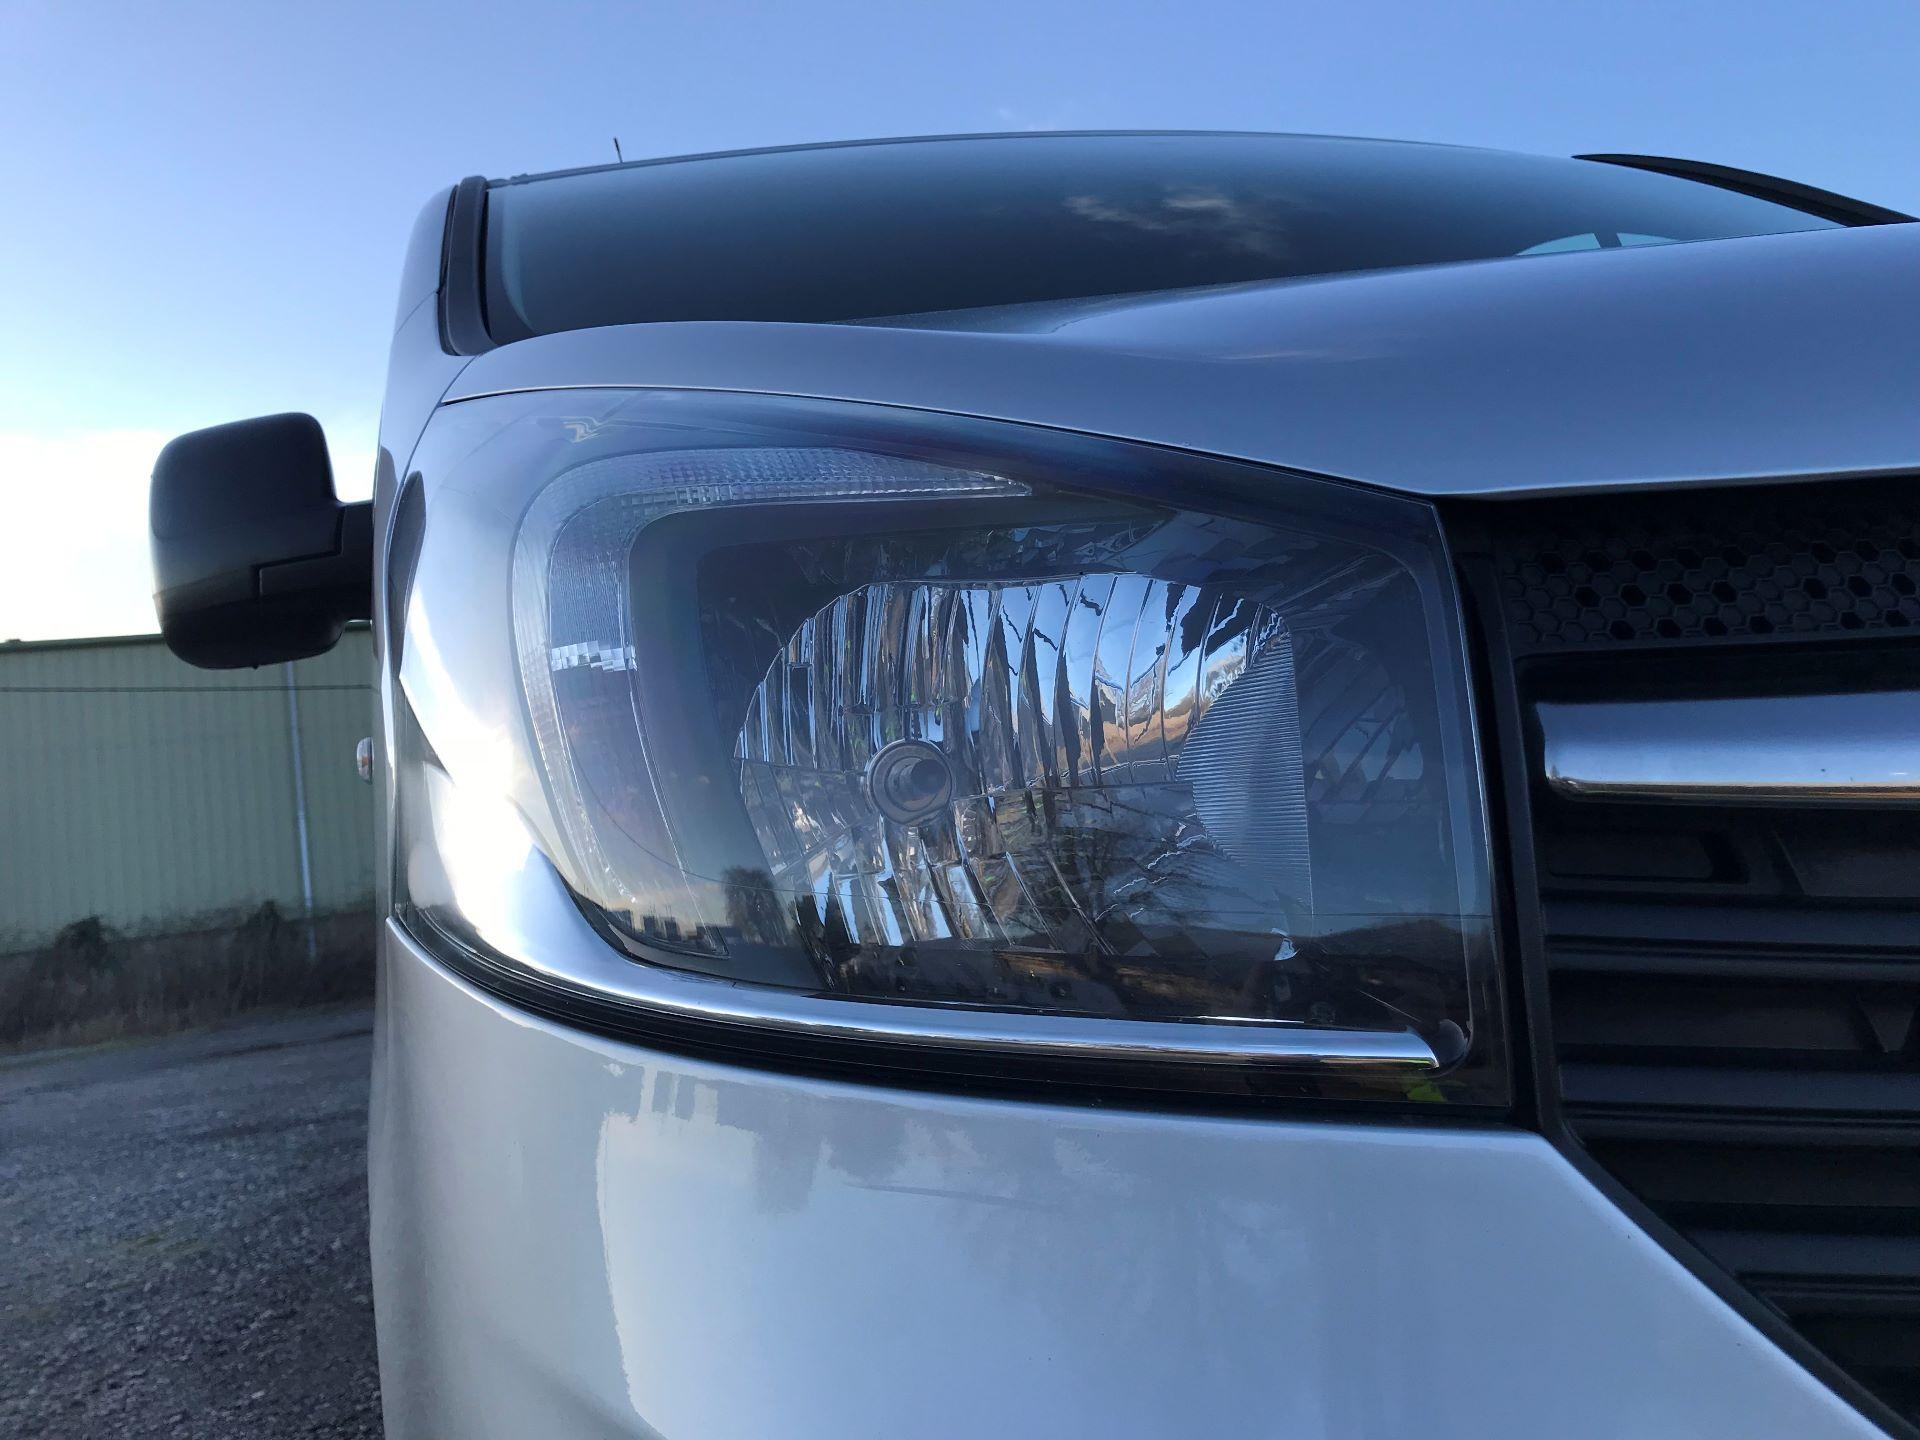 2017 Vauxhall Vivaro 2900 1.6Cdti Biturbo 125Ps H1 Combi 9 Seat (DY17UVM) Image 18